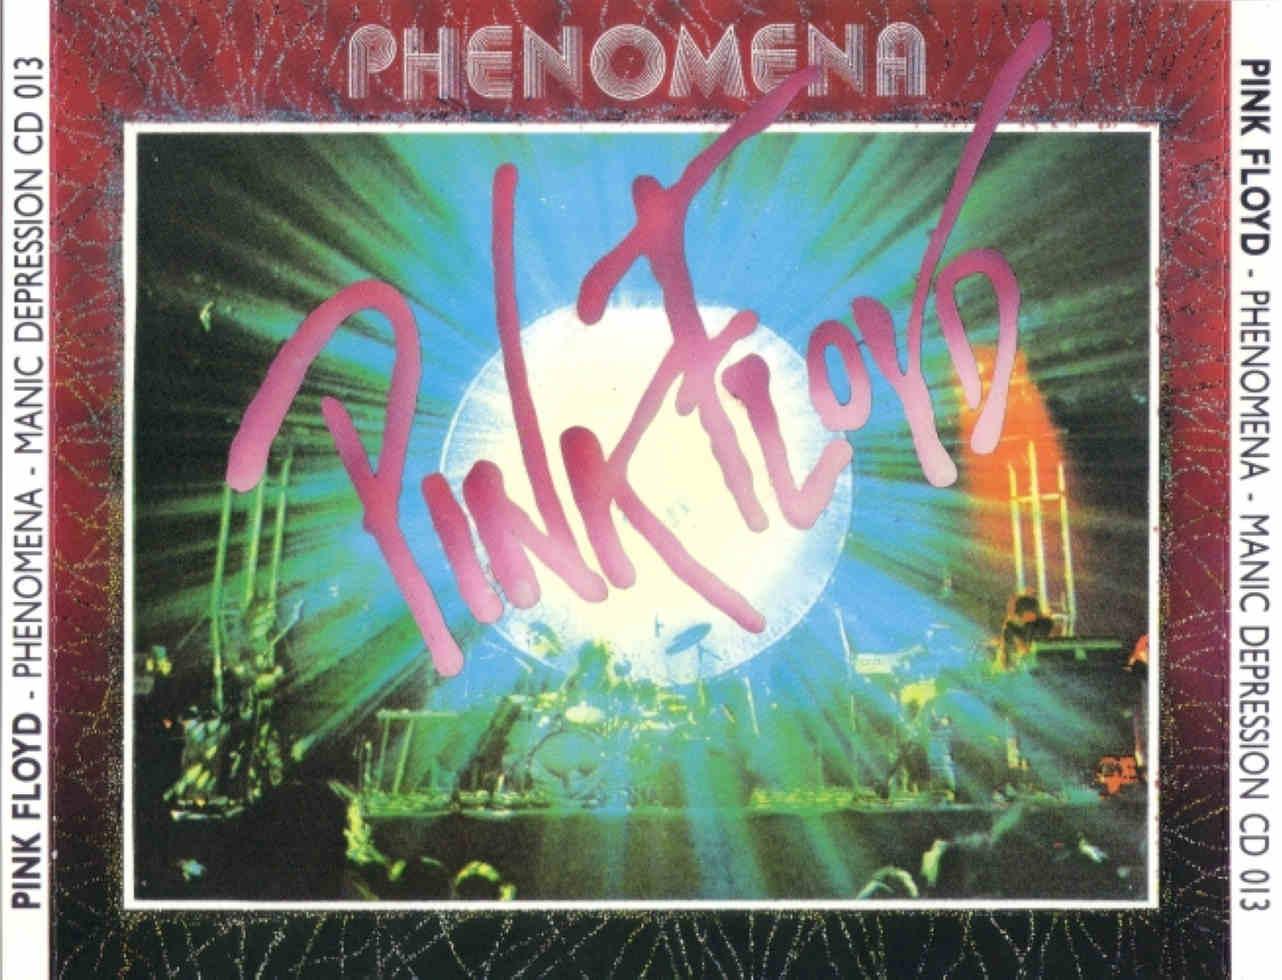 Download Pink Floyd A Saucerful Of Secrets Rar